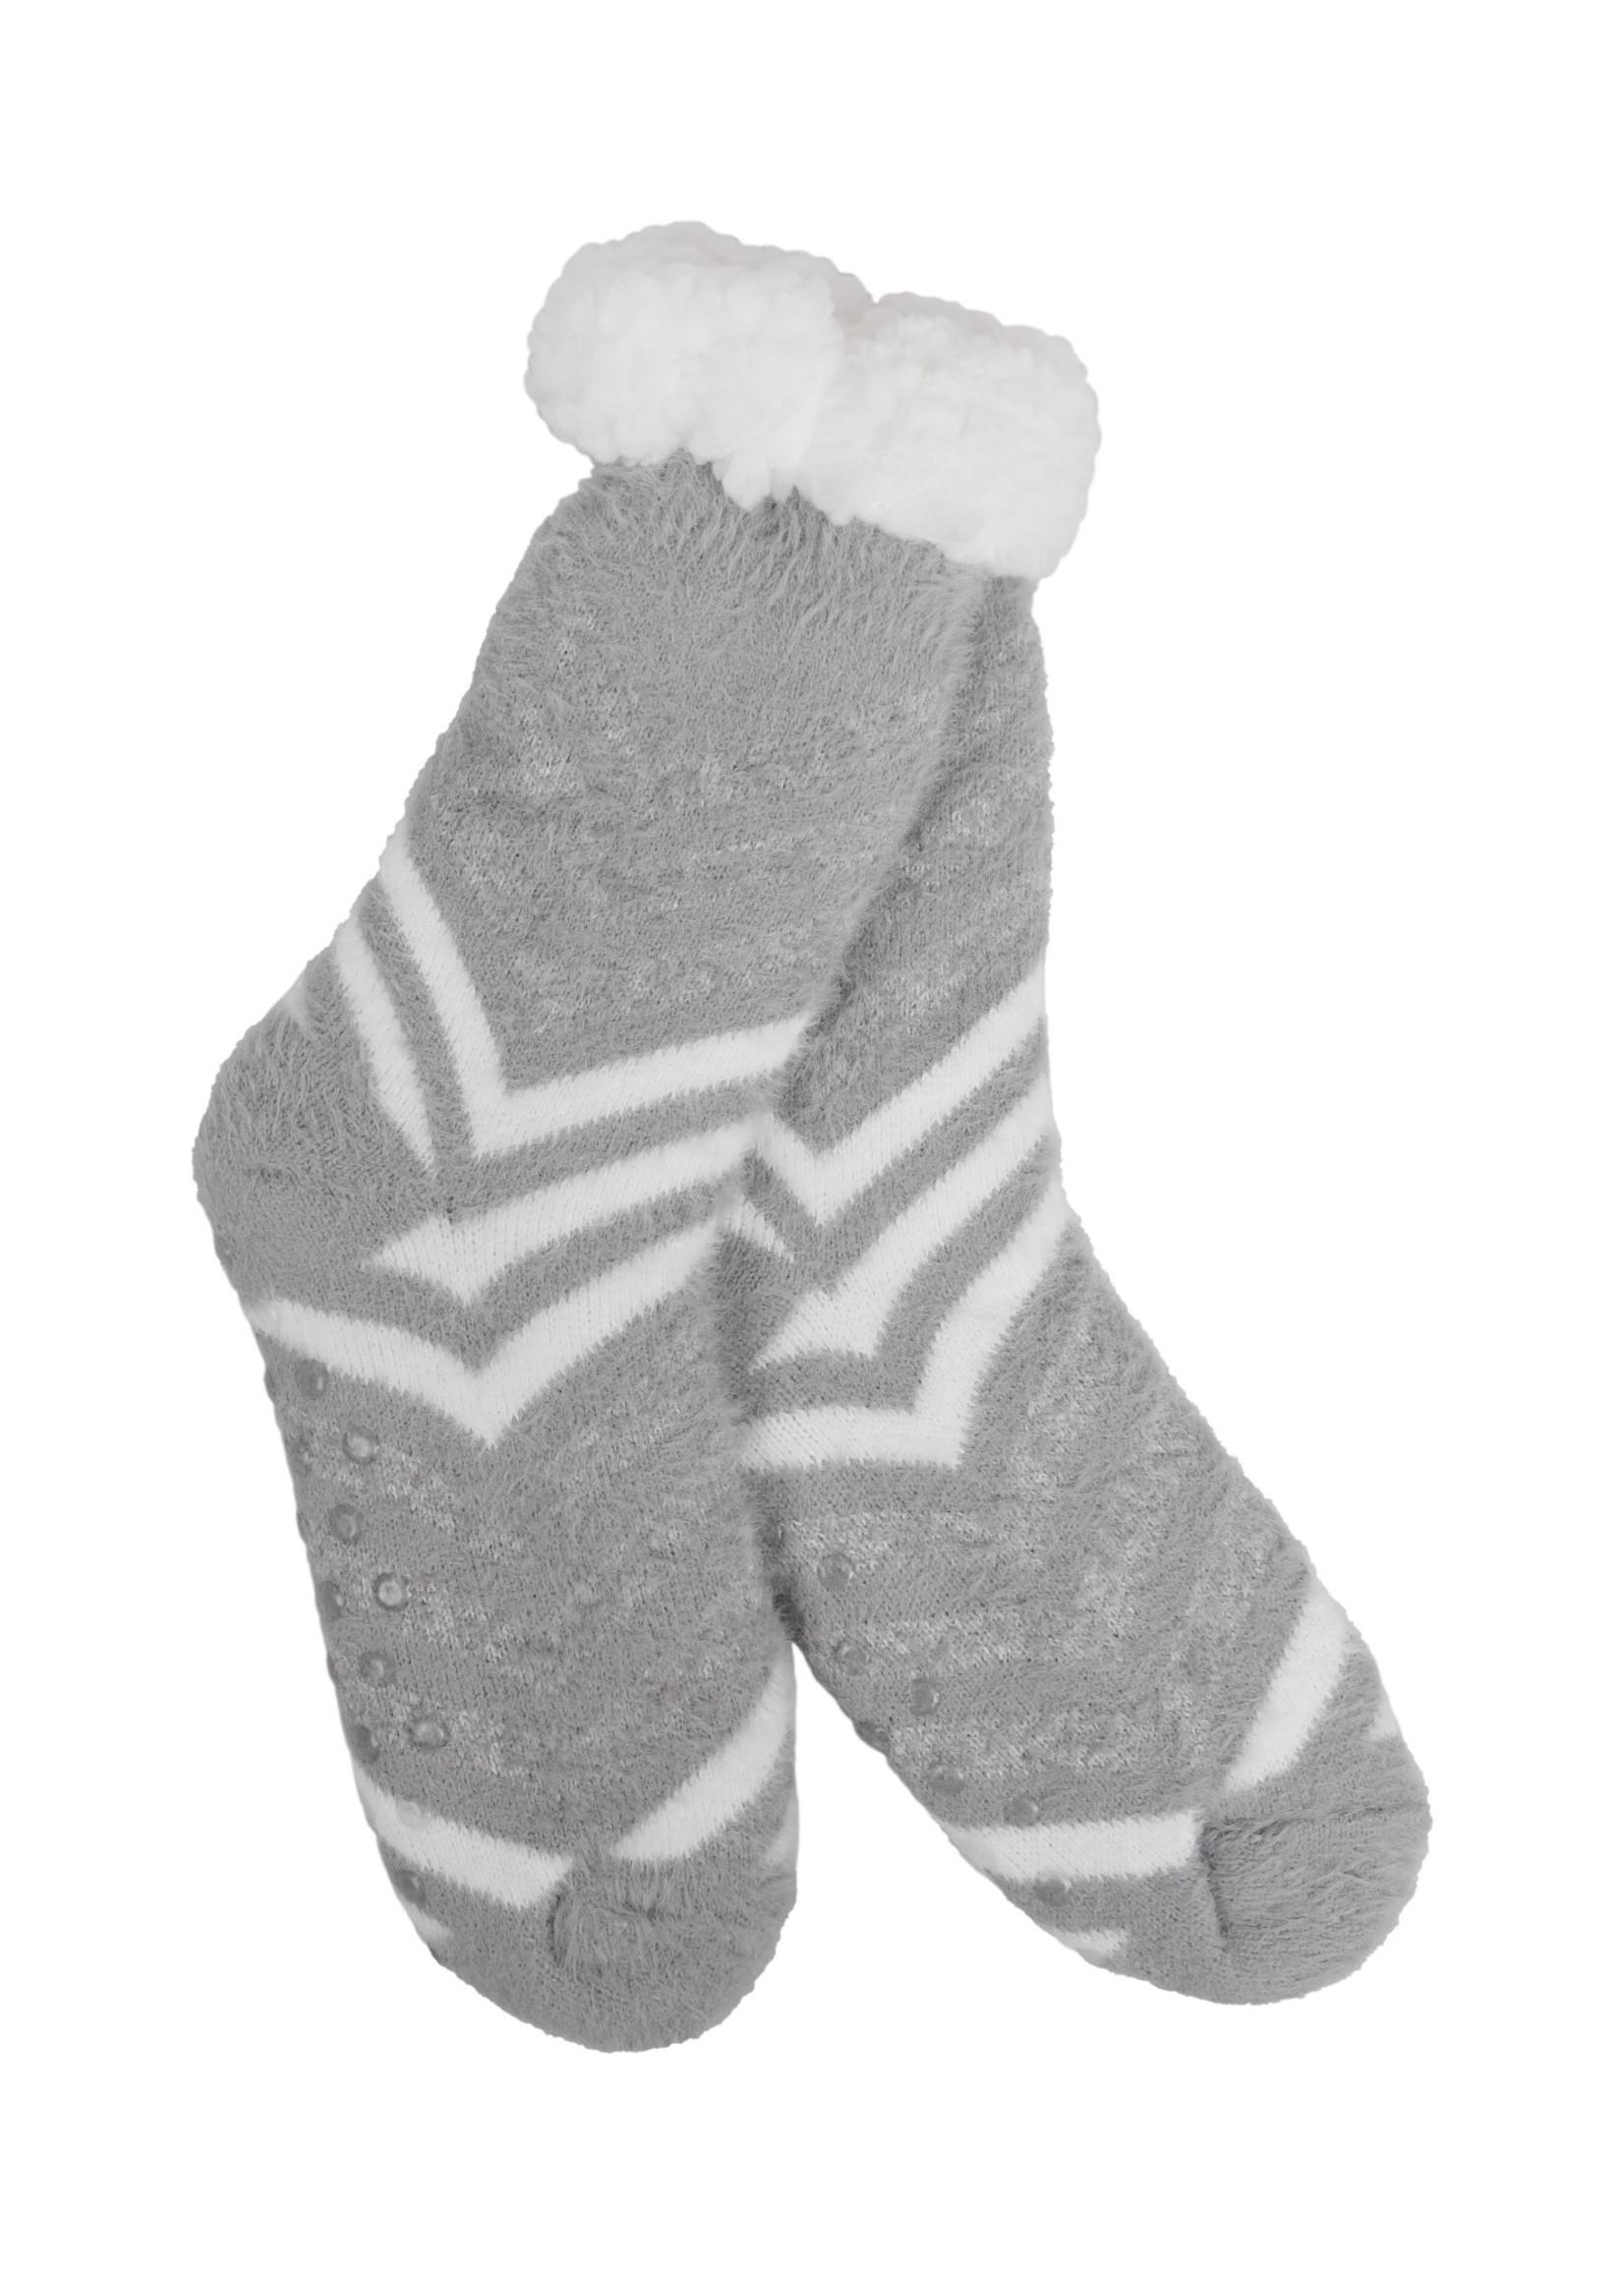 Fashion by Mirabeau Cozy Soft 5th Ave Thermal Slipper Socks